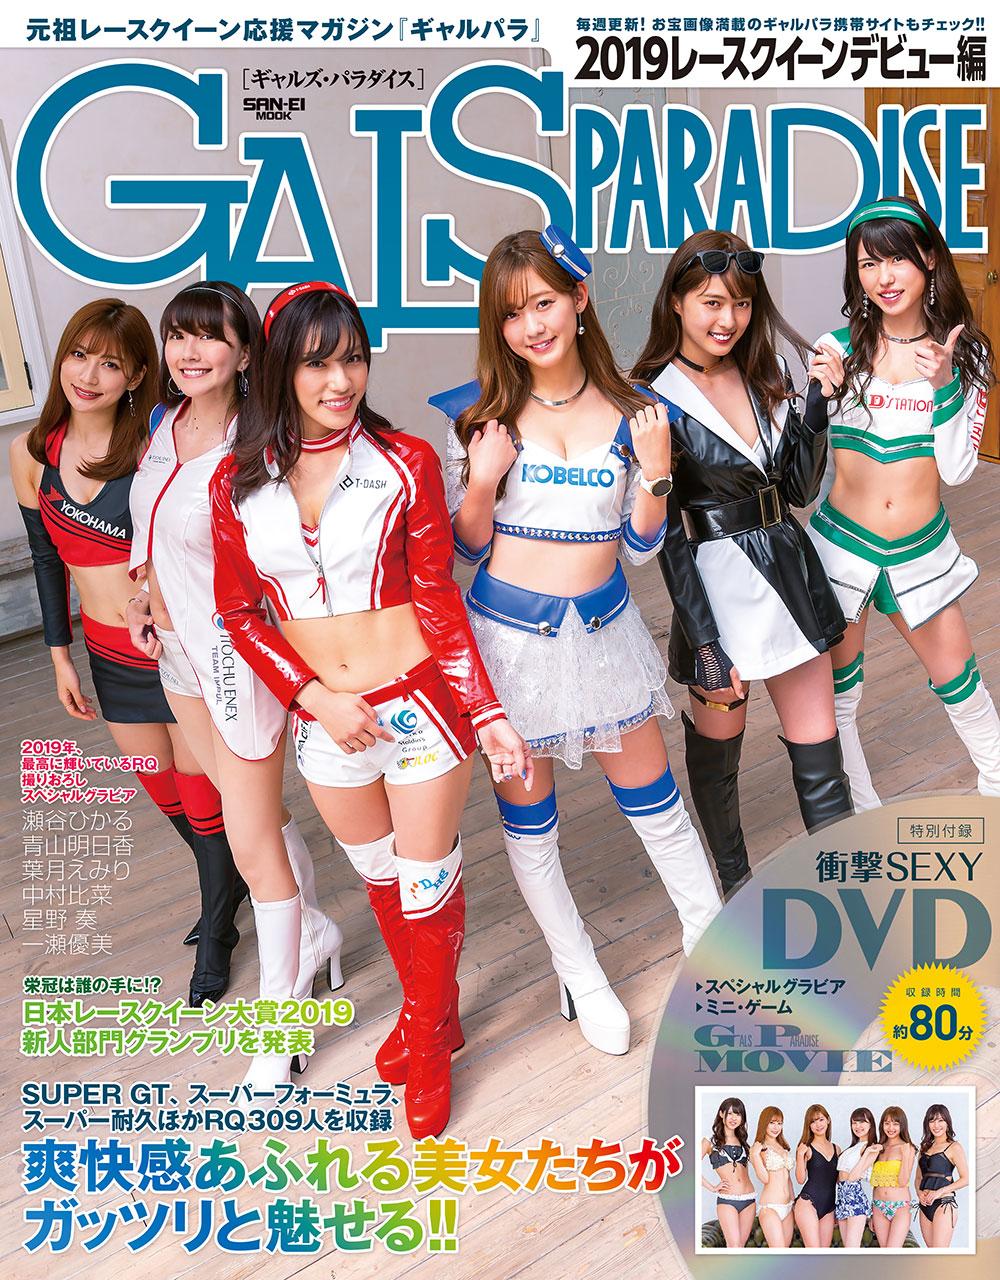 GALS PARADICE | GALS PARADISE 2019 レースクイーンデビュー編